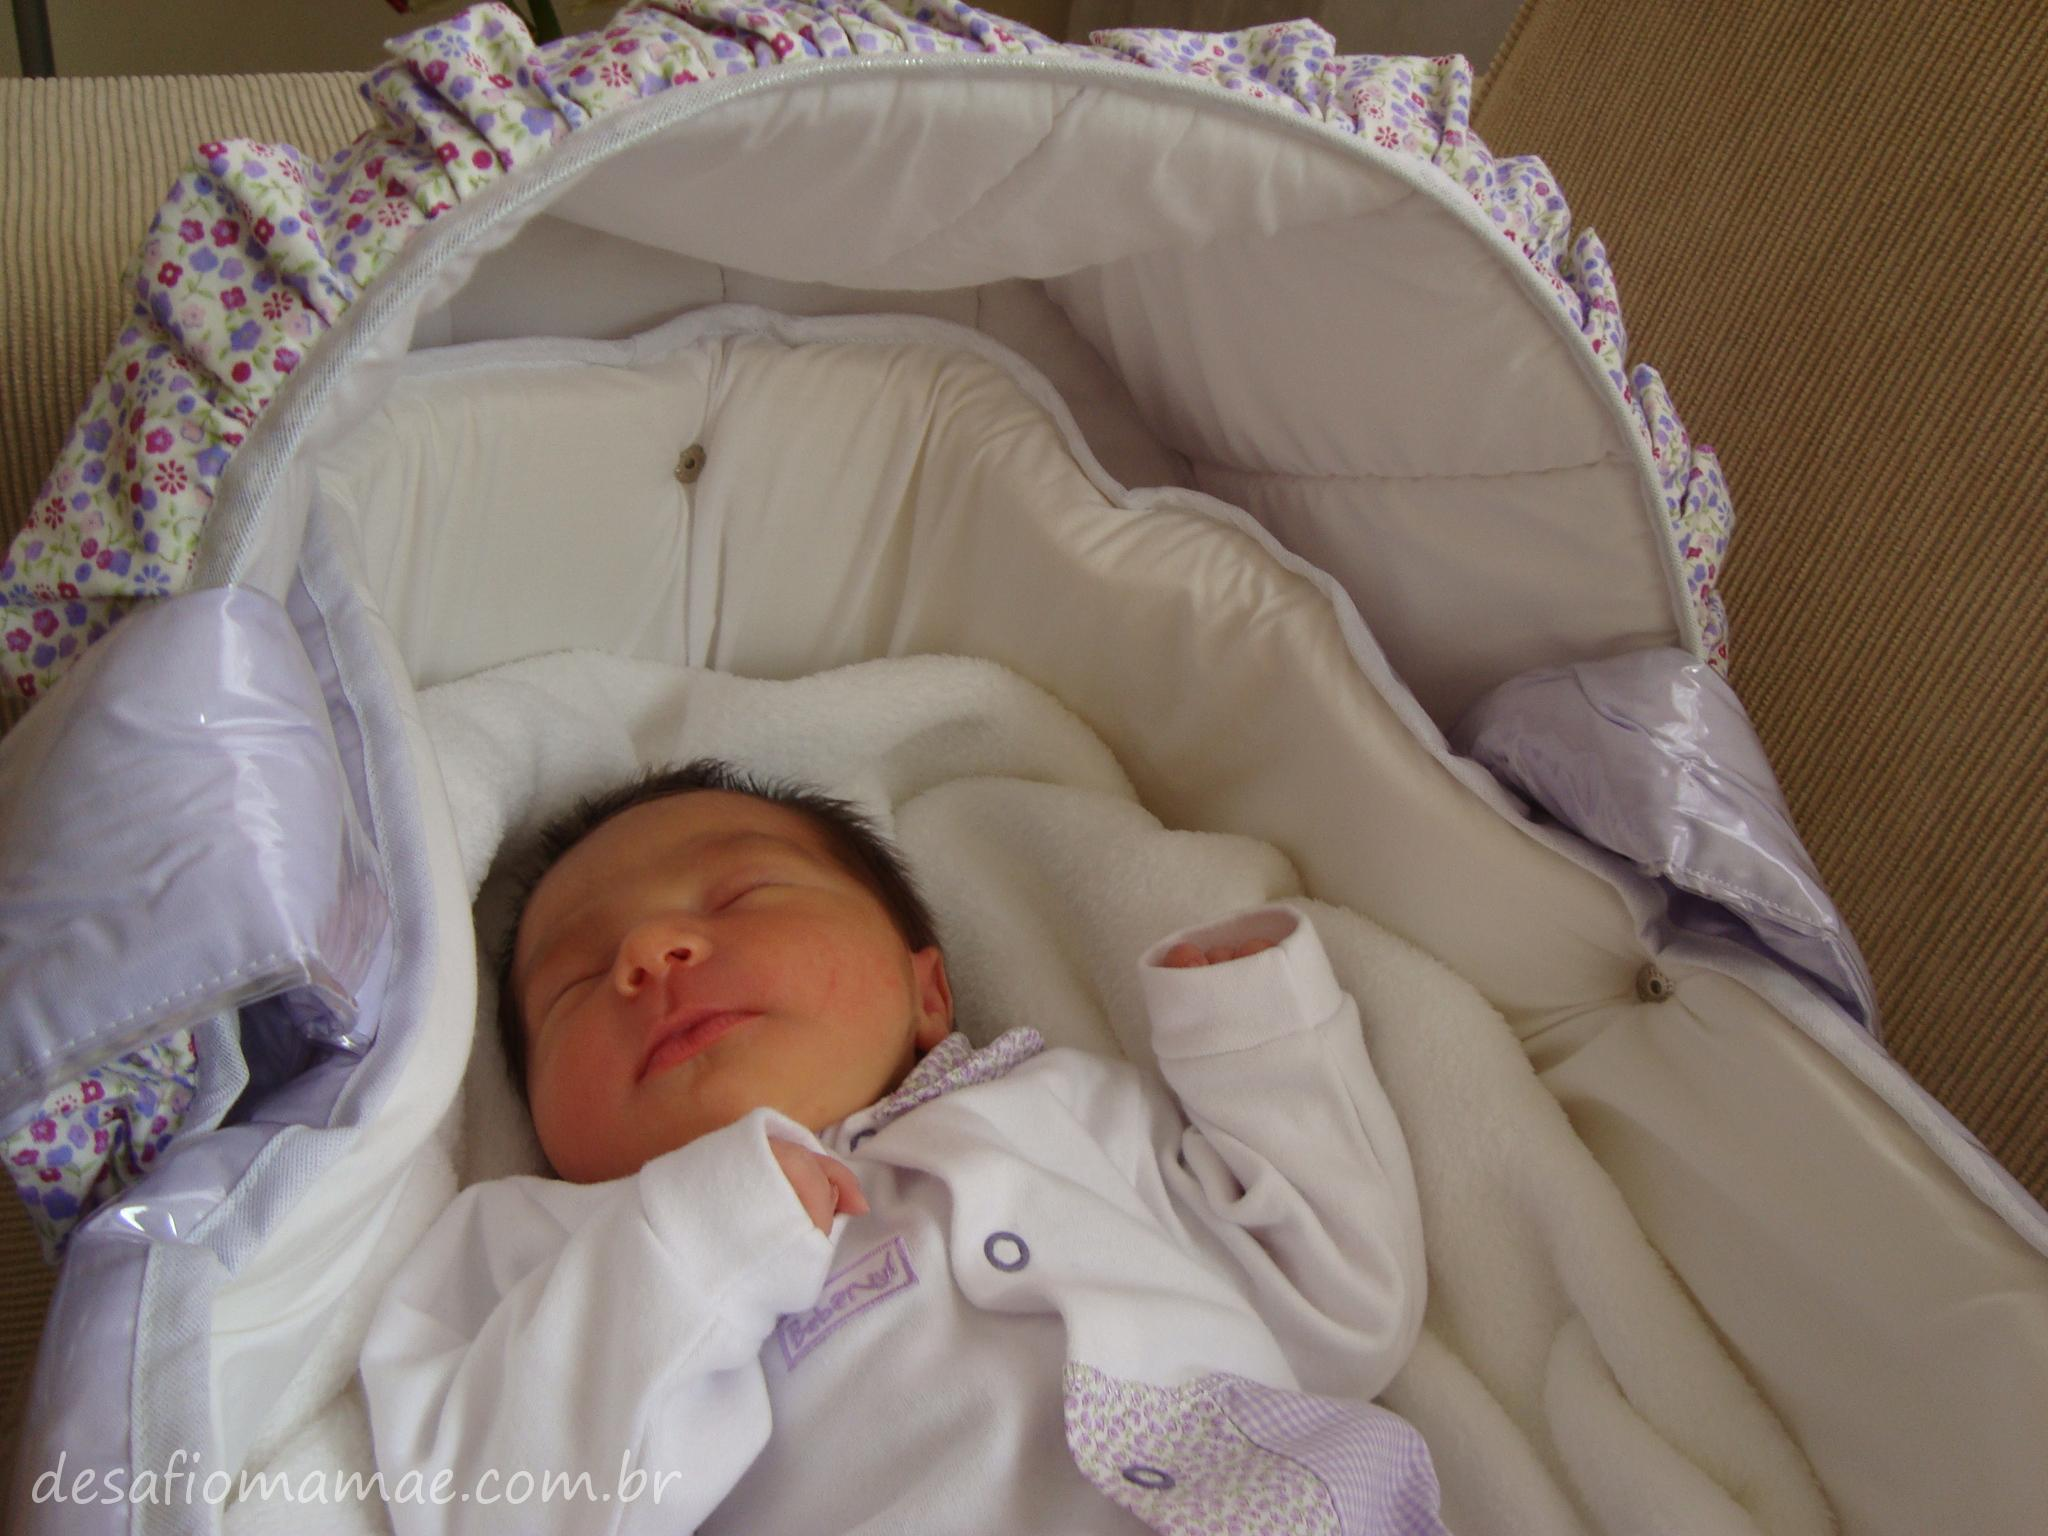 Montando o enxoval do bebê